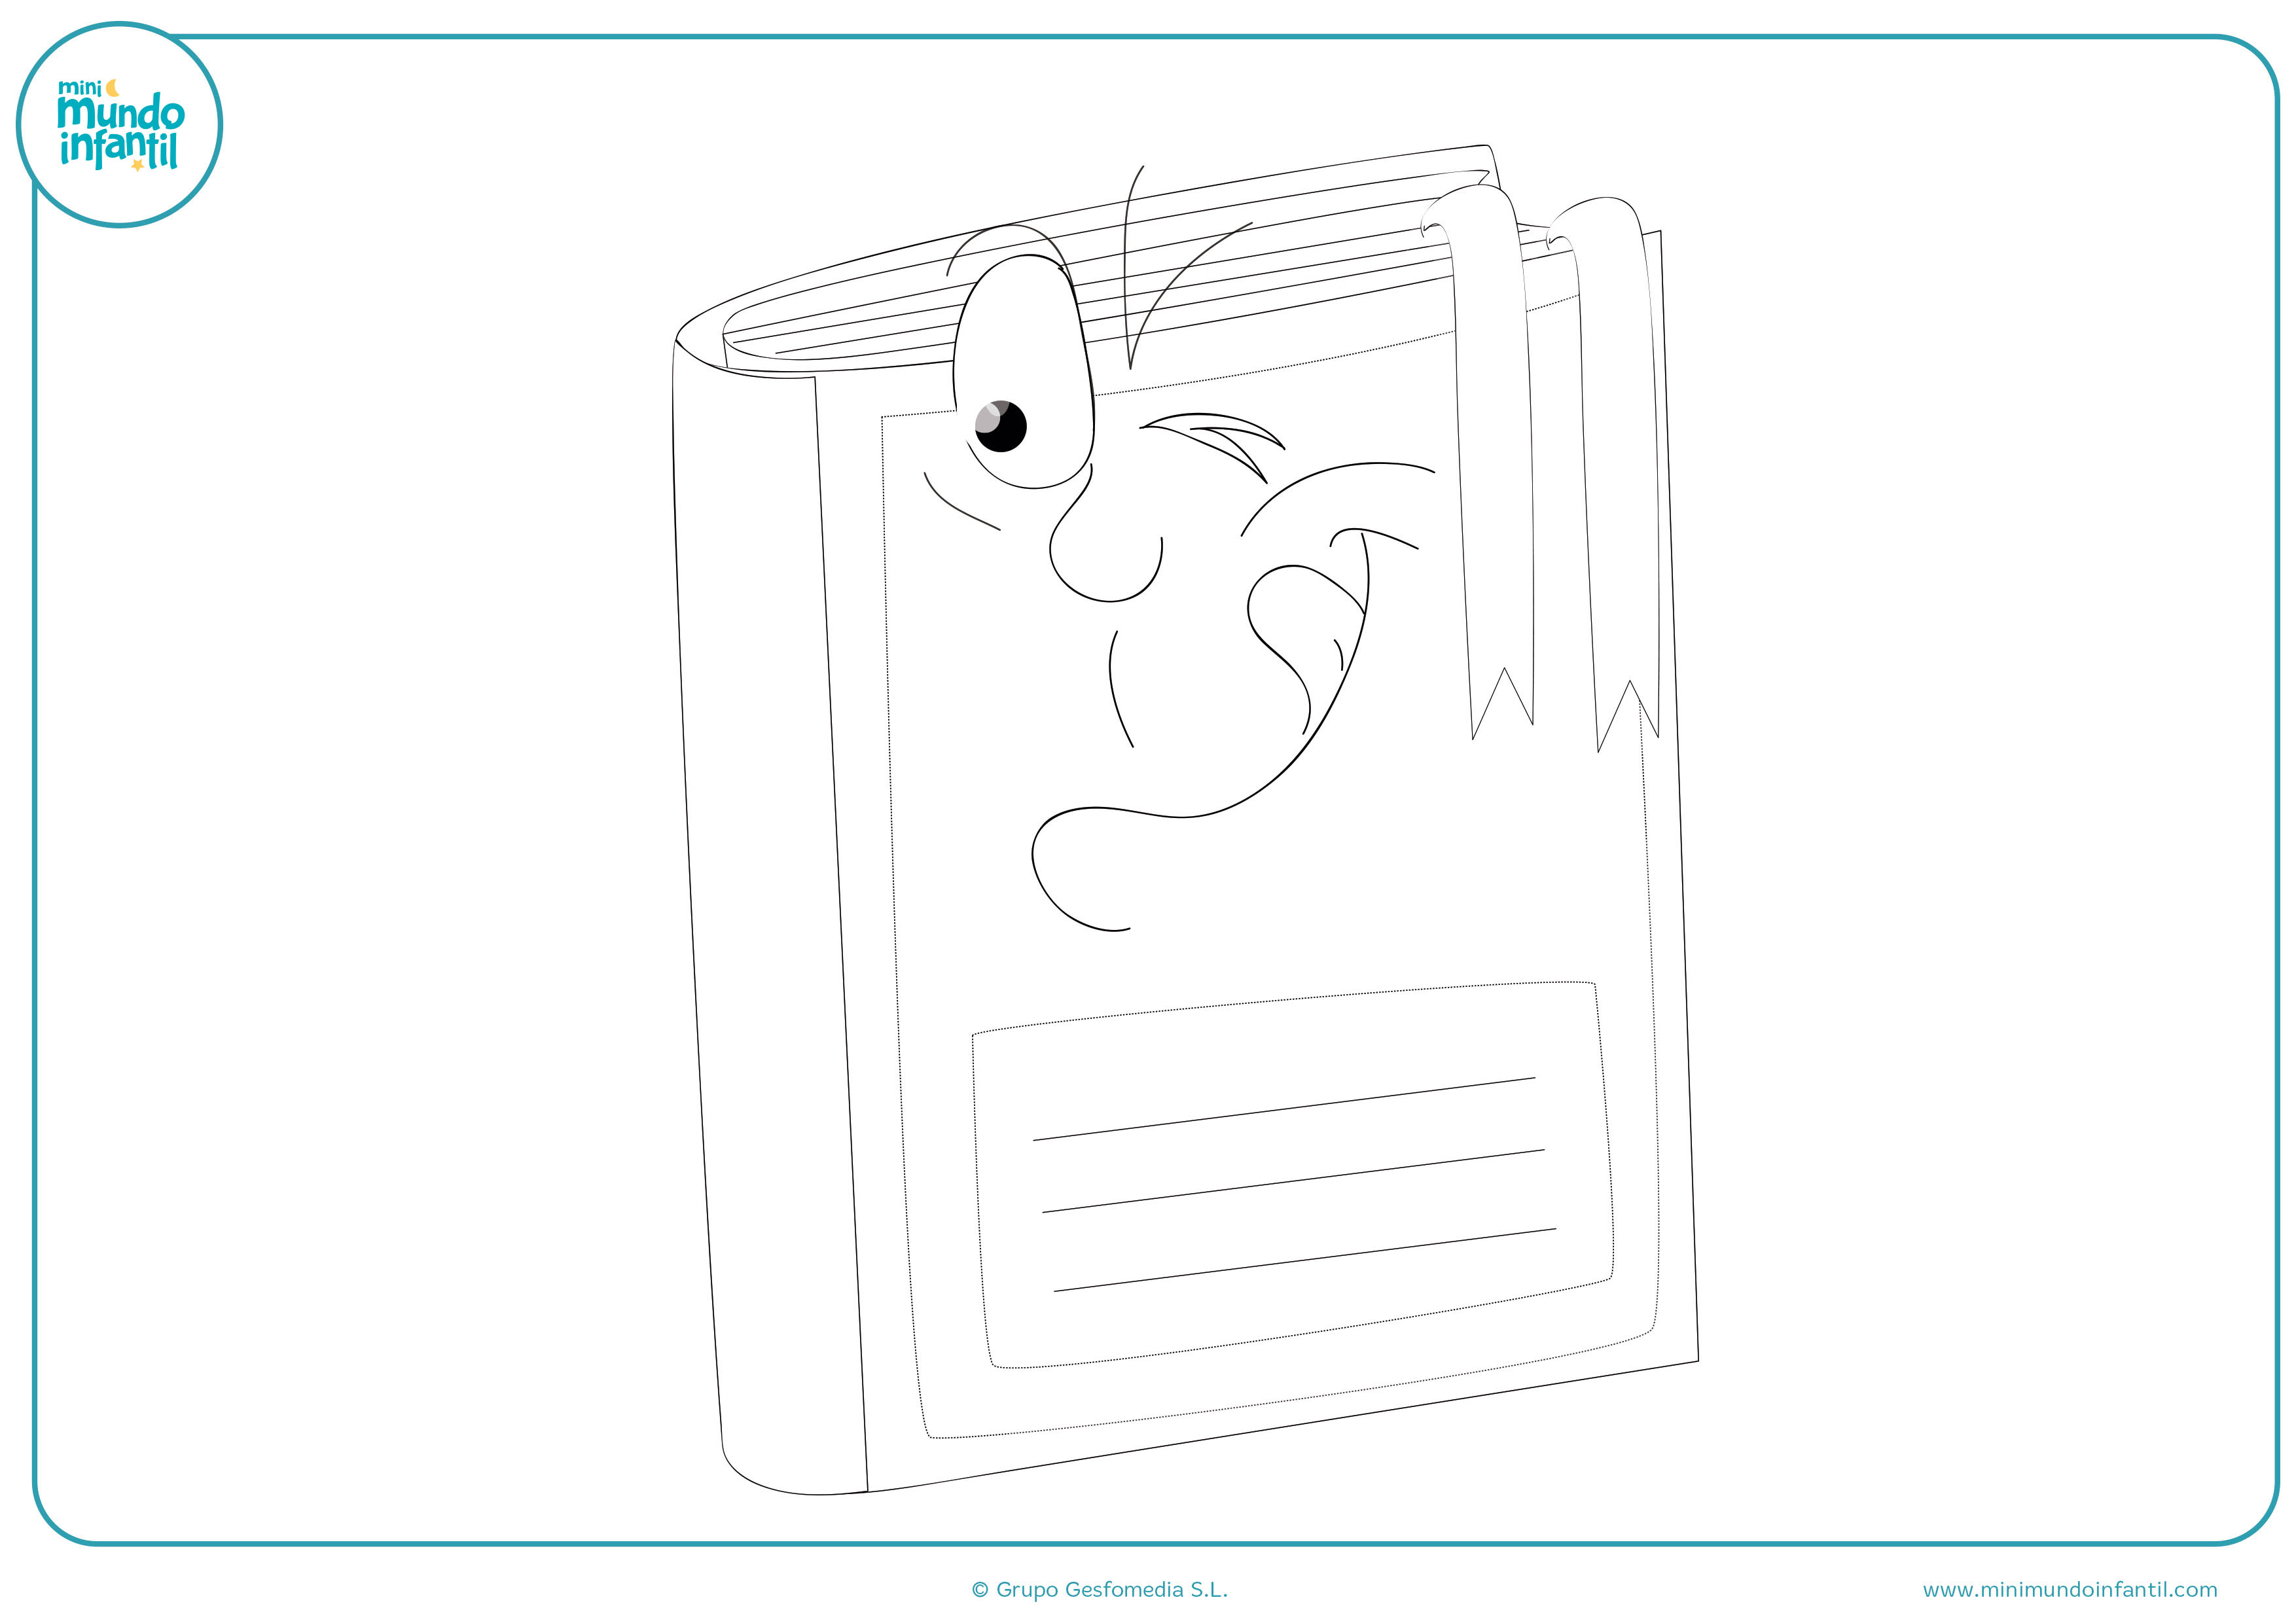 Descargar dibujo escolar material colorear gratis